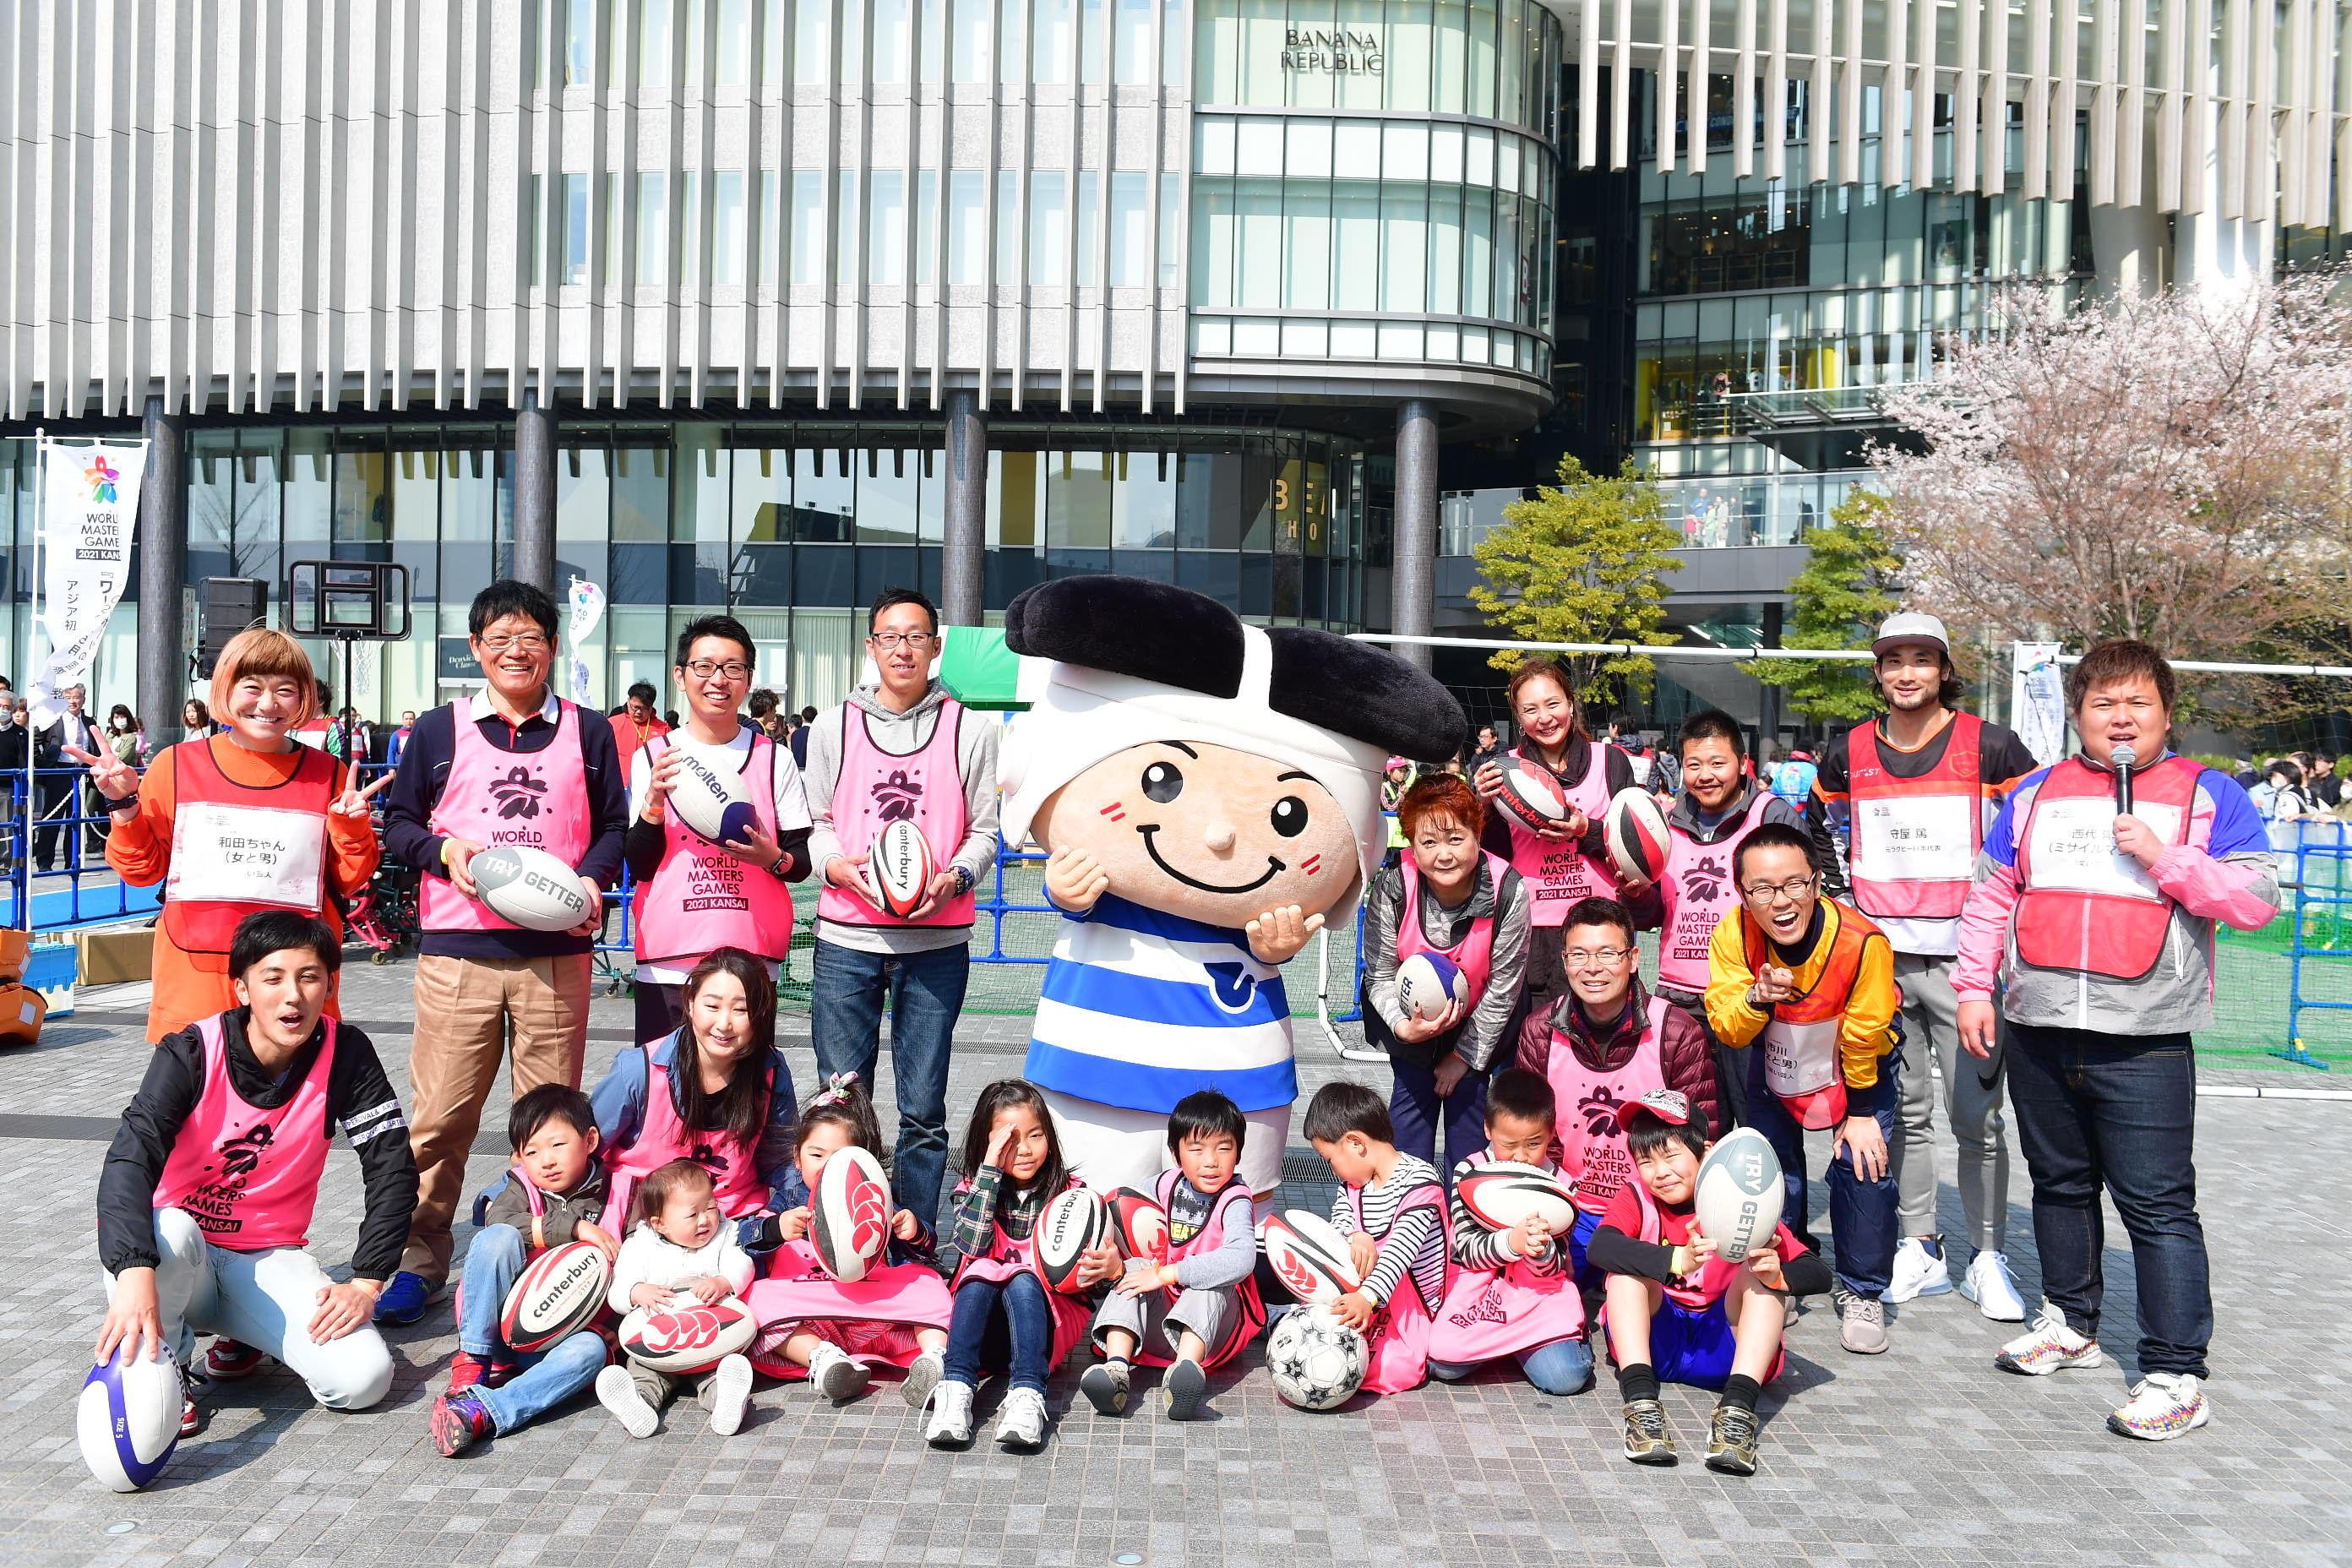 http://news.yoshimoto.co.jp/20180325180335-c1aa1a8d03f24c190506a399c174530501966979.jpg